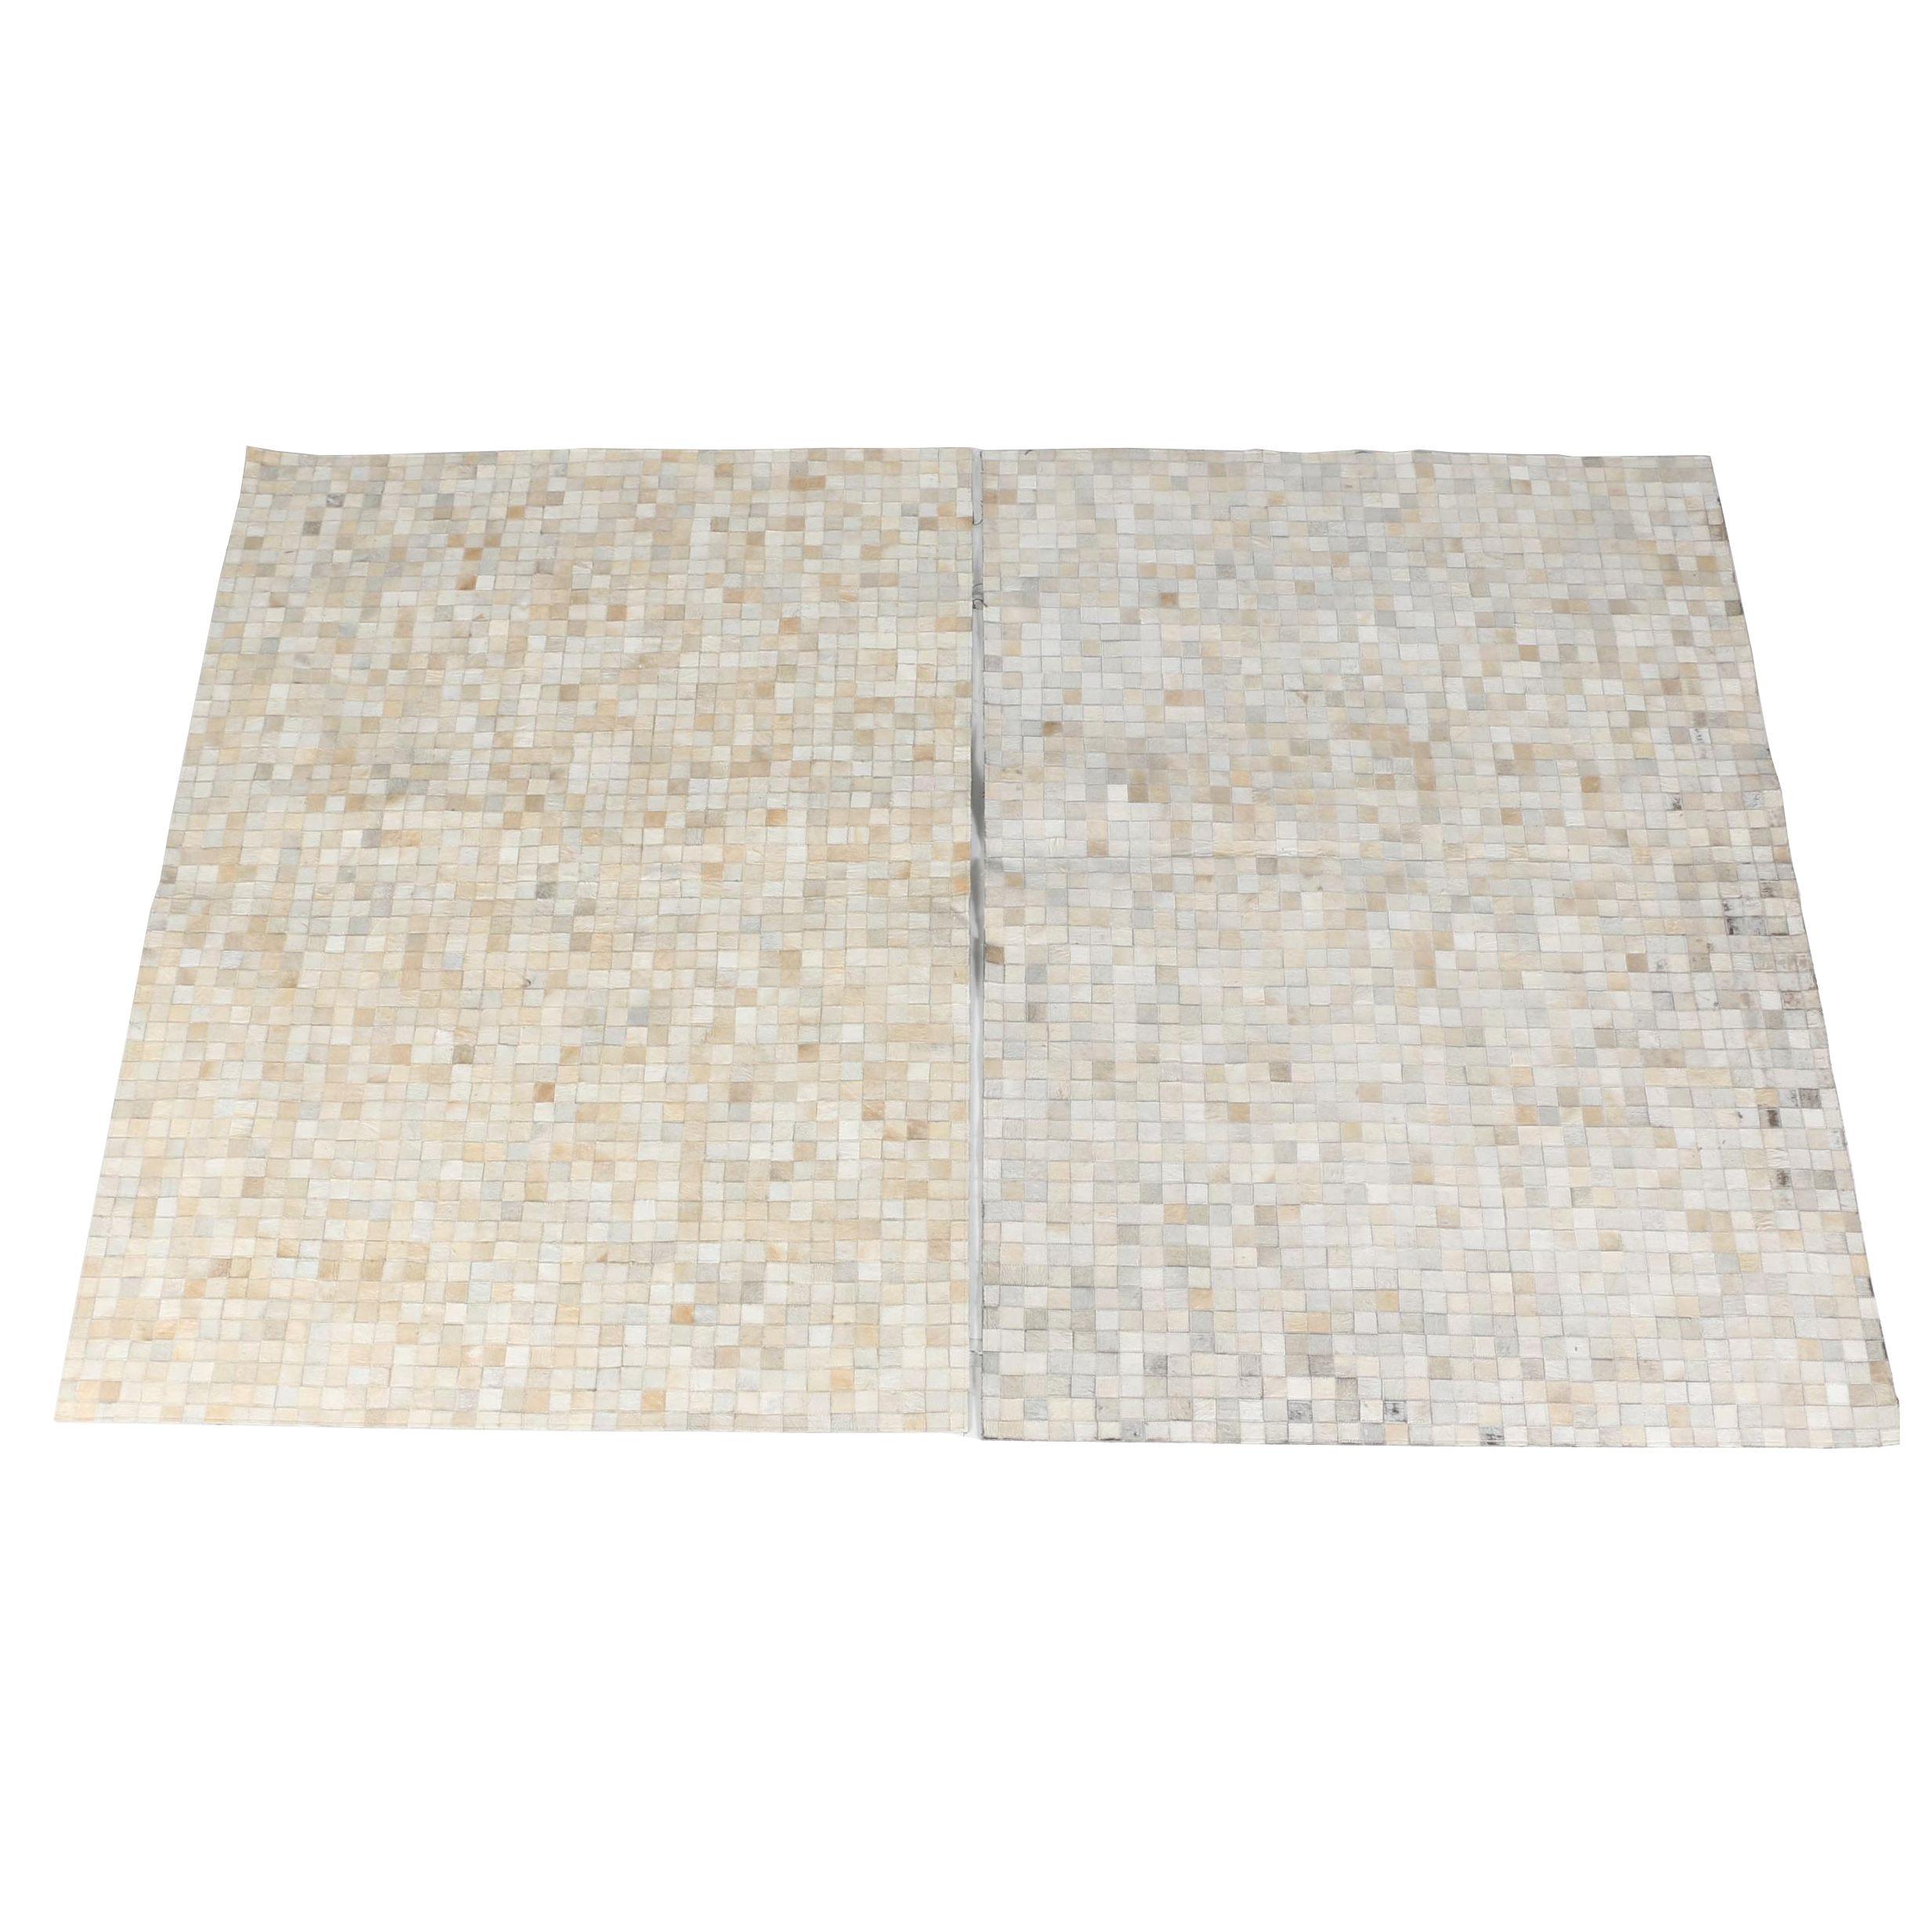 Handmade Indian Checkerboard Hide Area Rugs